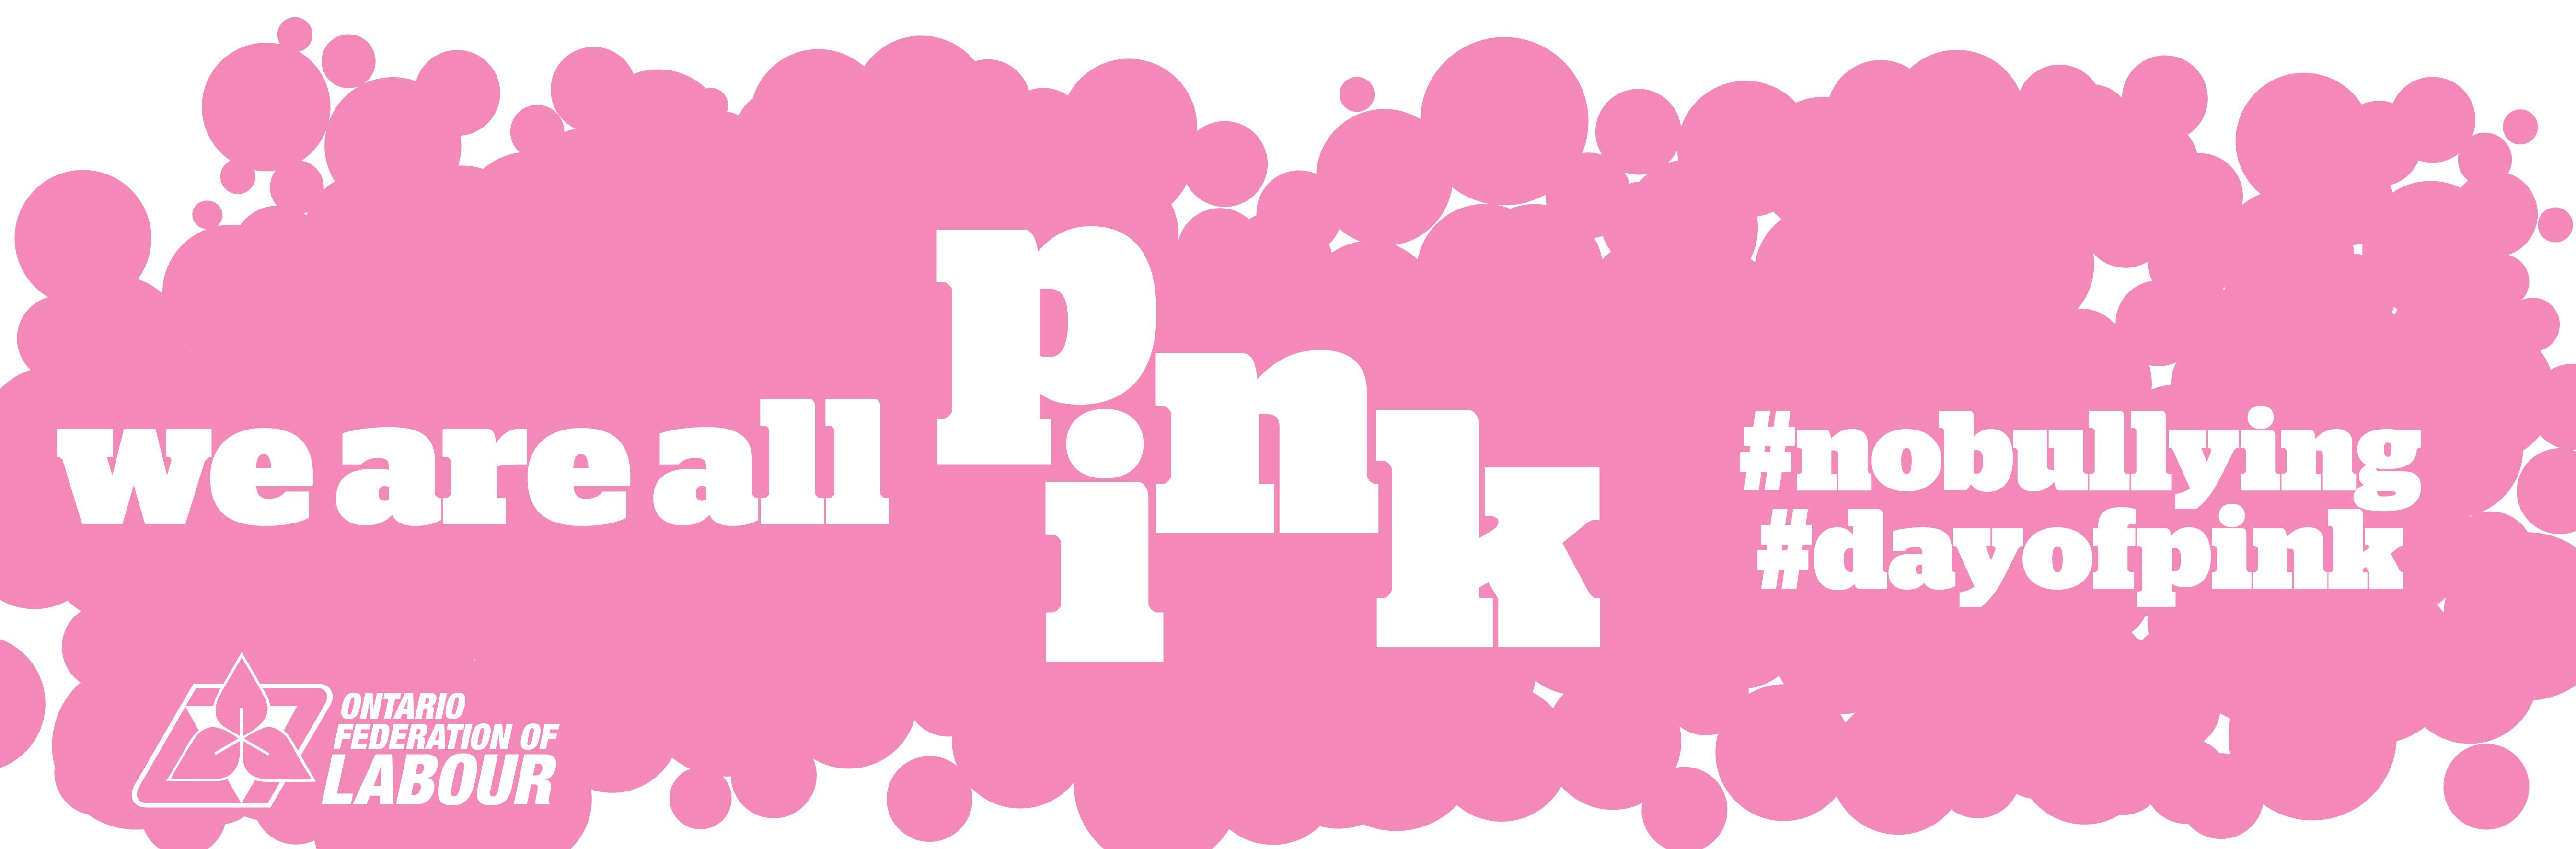 2015.04.08-DayofPink-1290x425